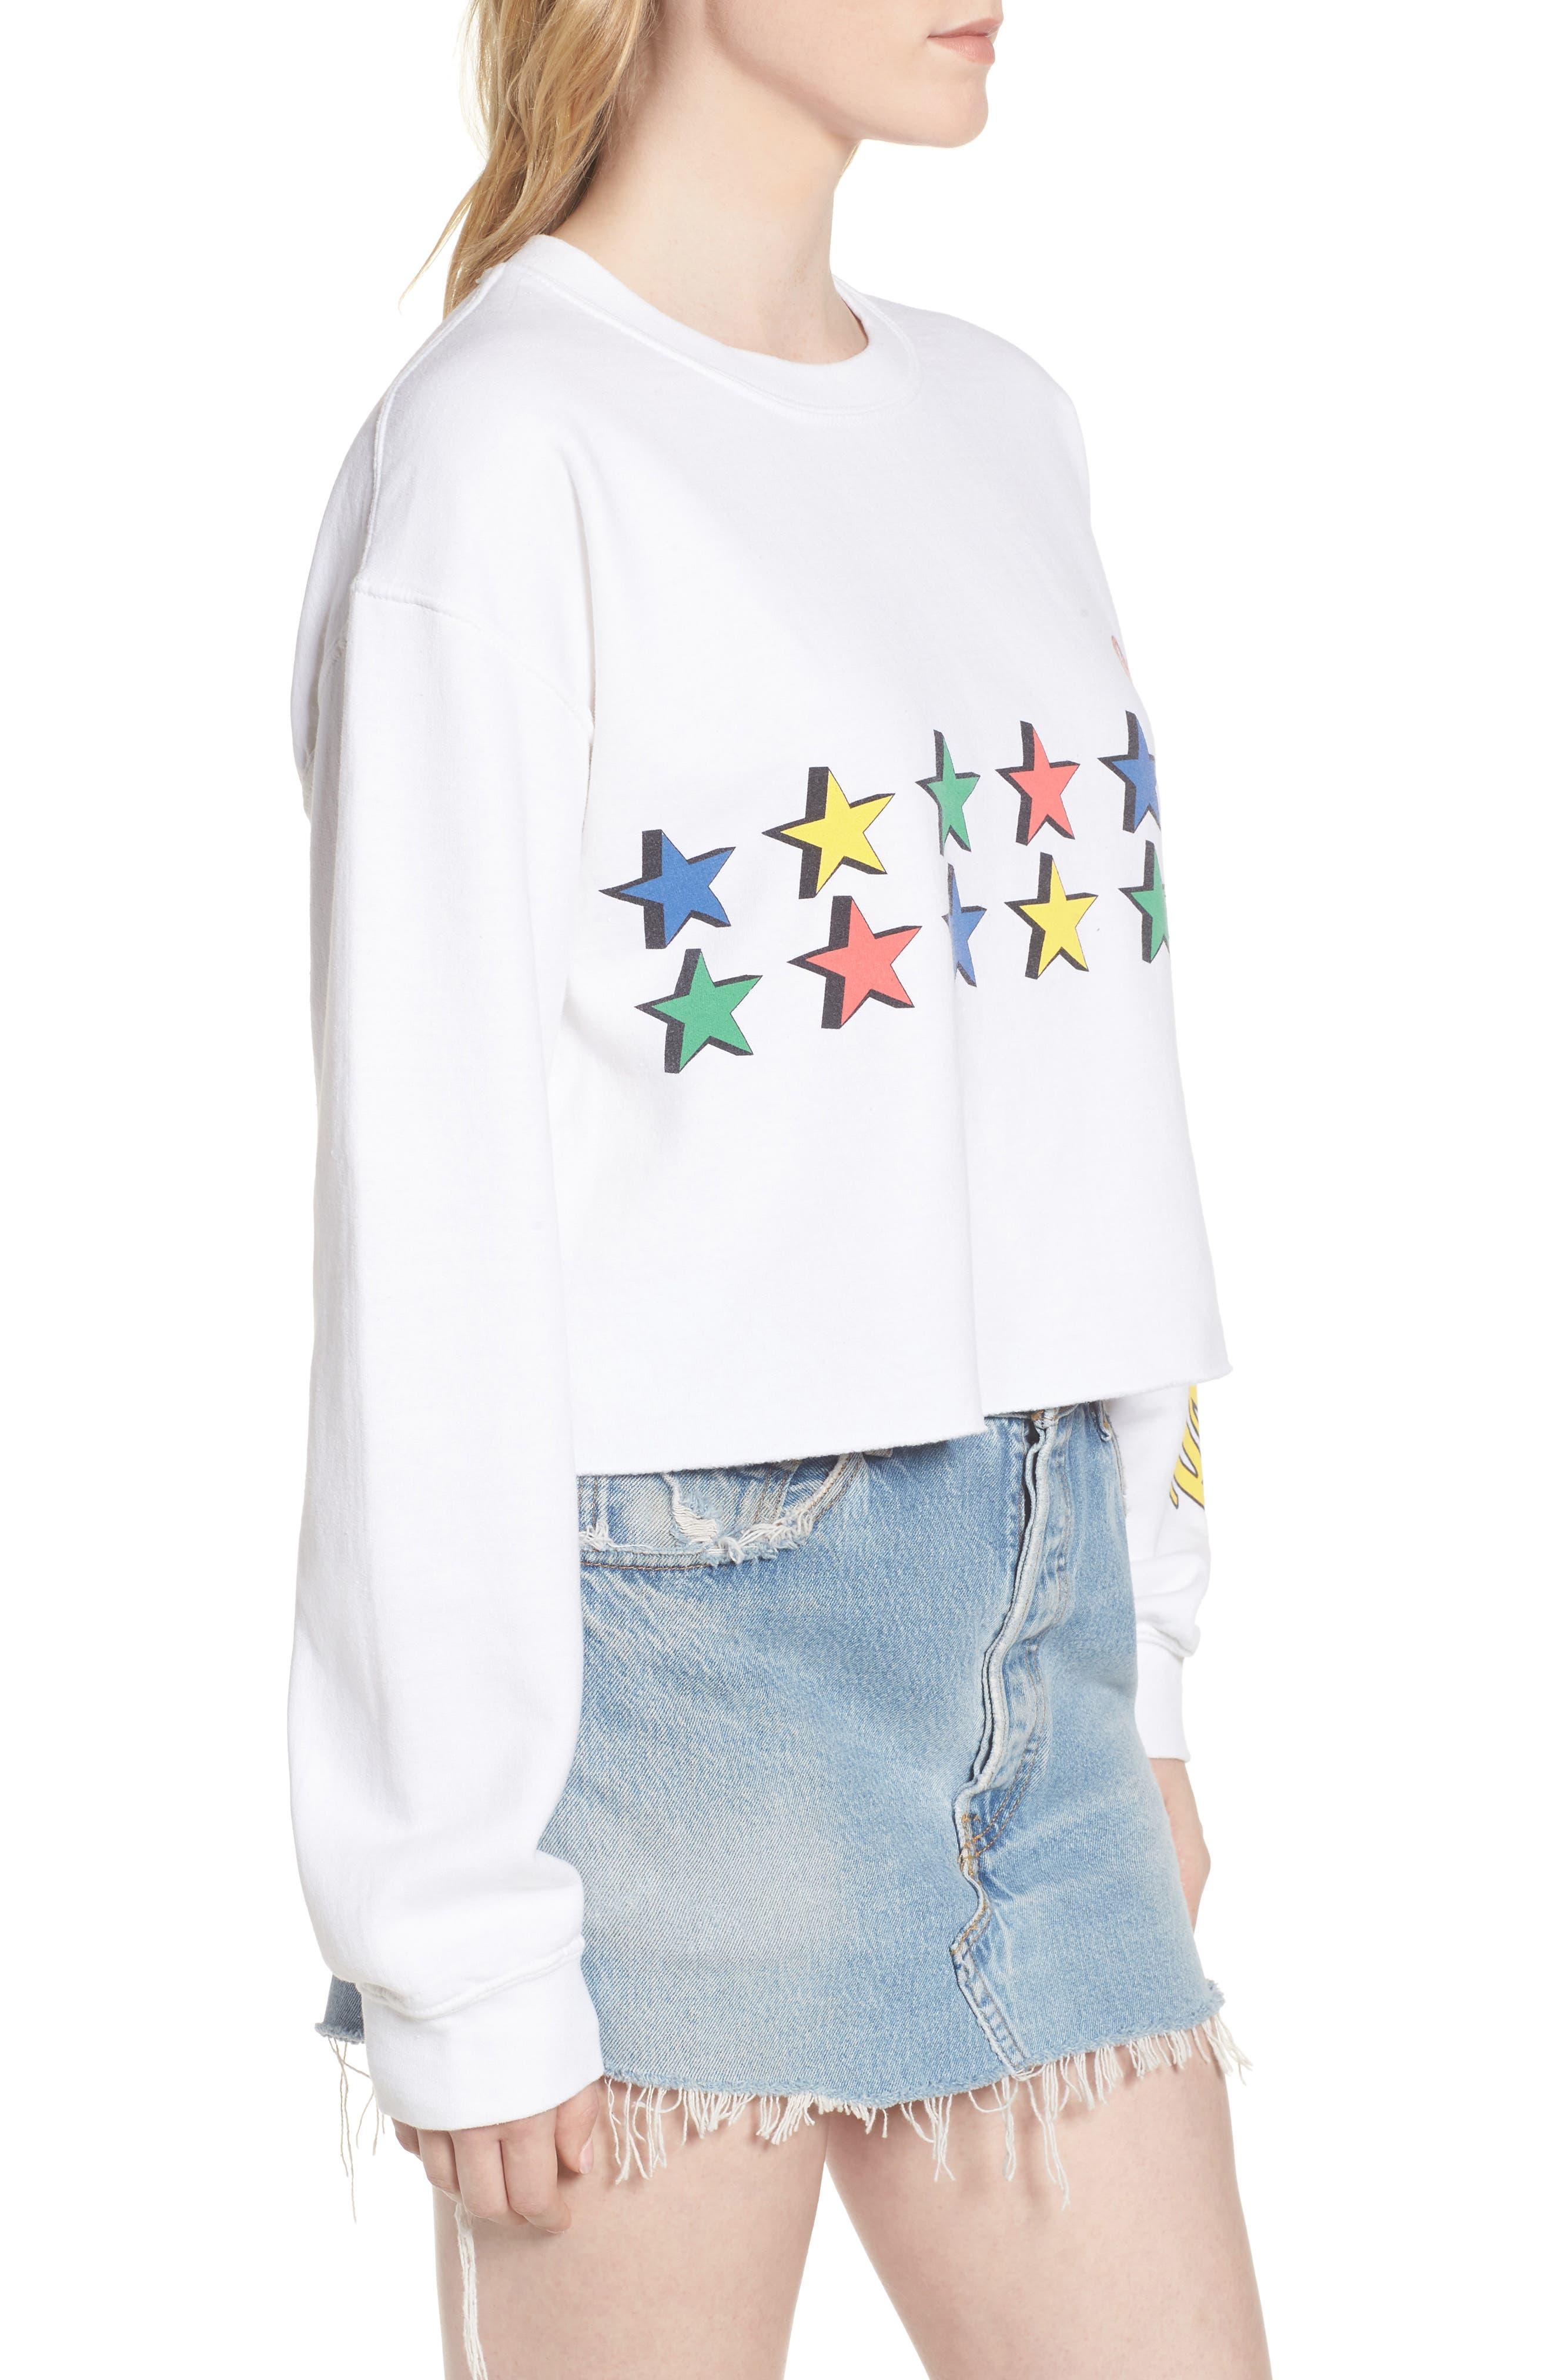 Coke Stars Crop Sweatshirt,                             Alternate thumbnail 3, color,